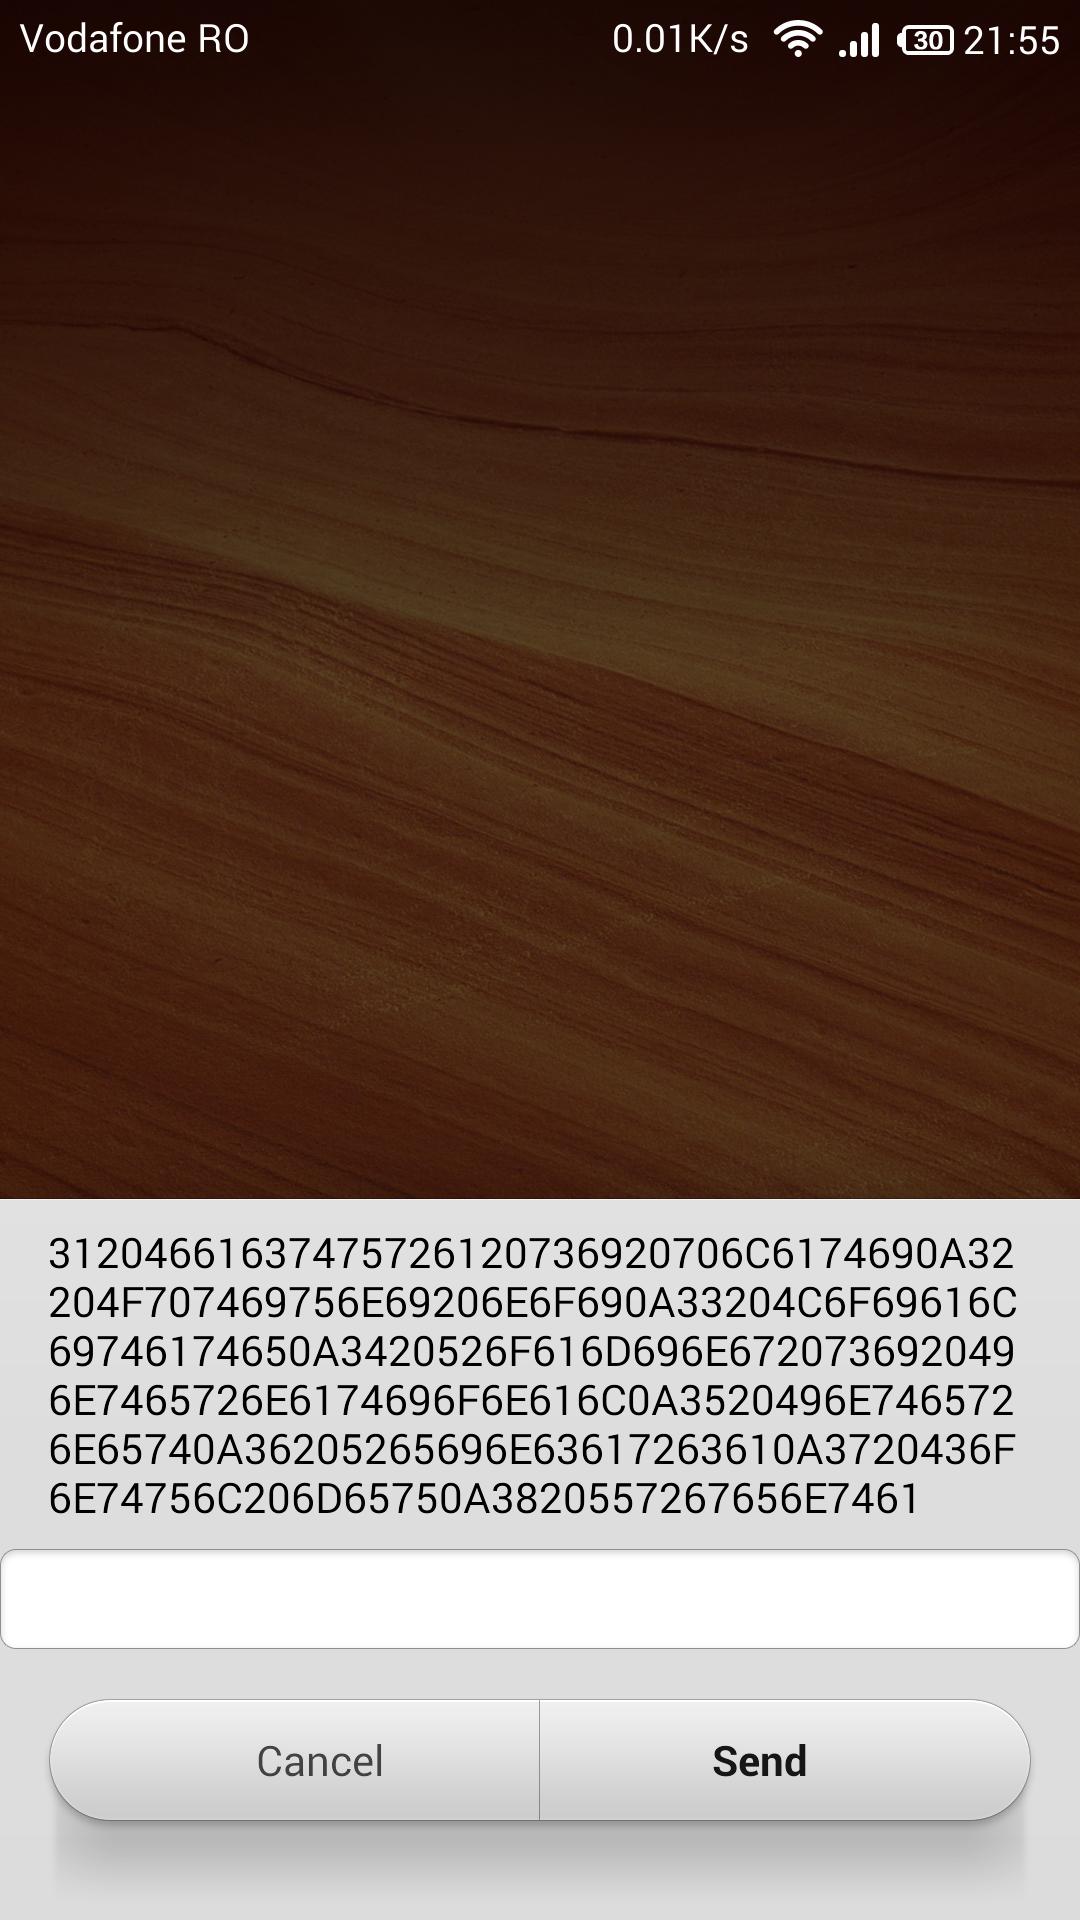 Screenshot_2014-02-10-21-55-49.png